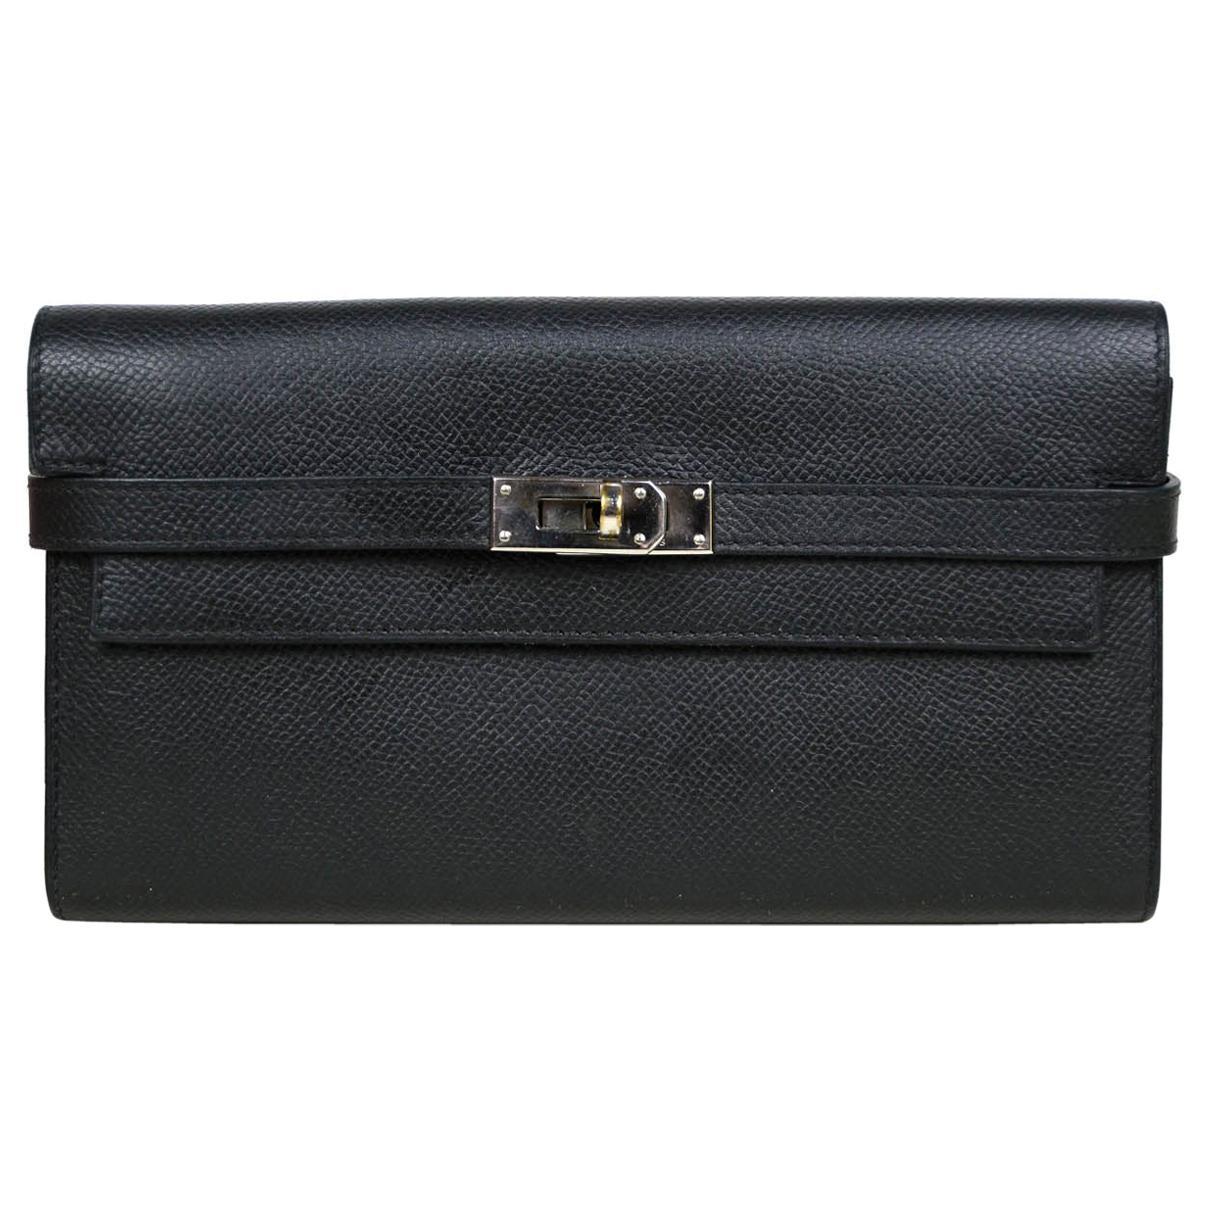 Hermes Black Epsom Kelly Longue Wallet w/ Palladium Hardware rt. $3,375